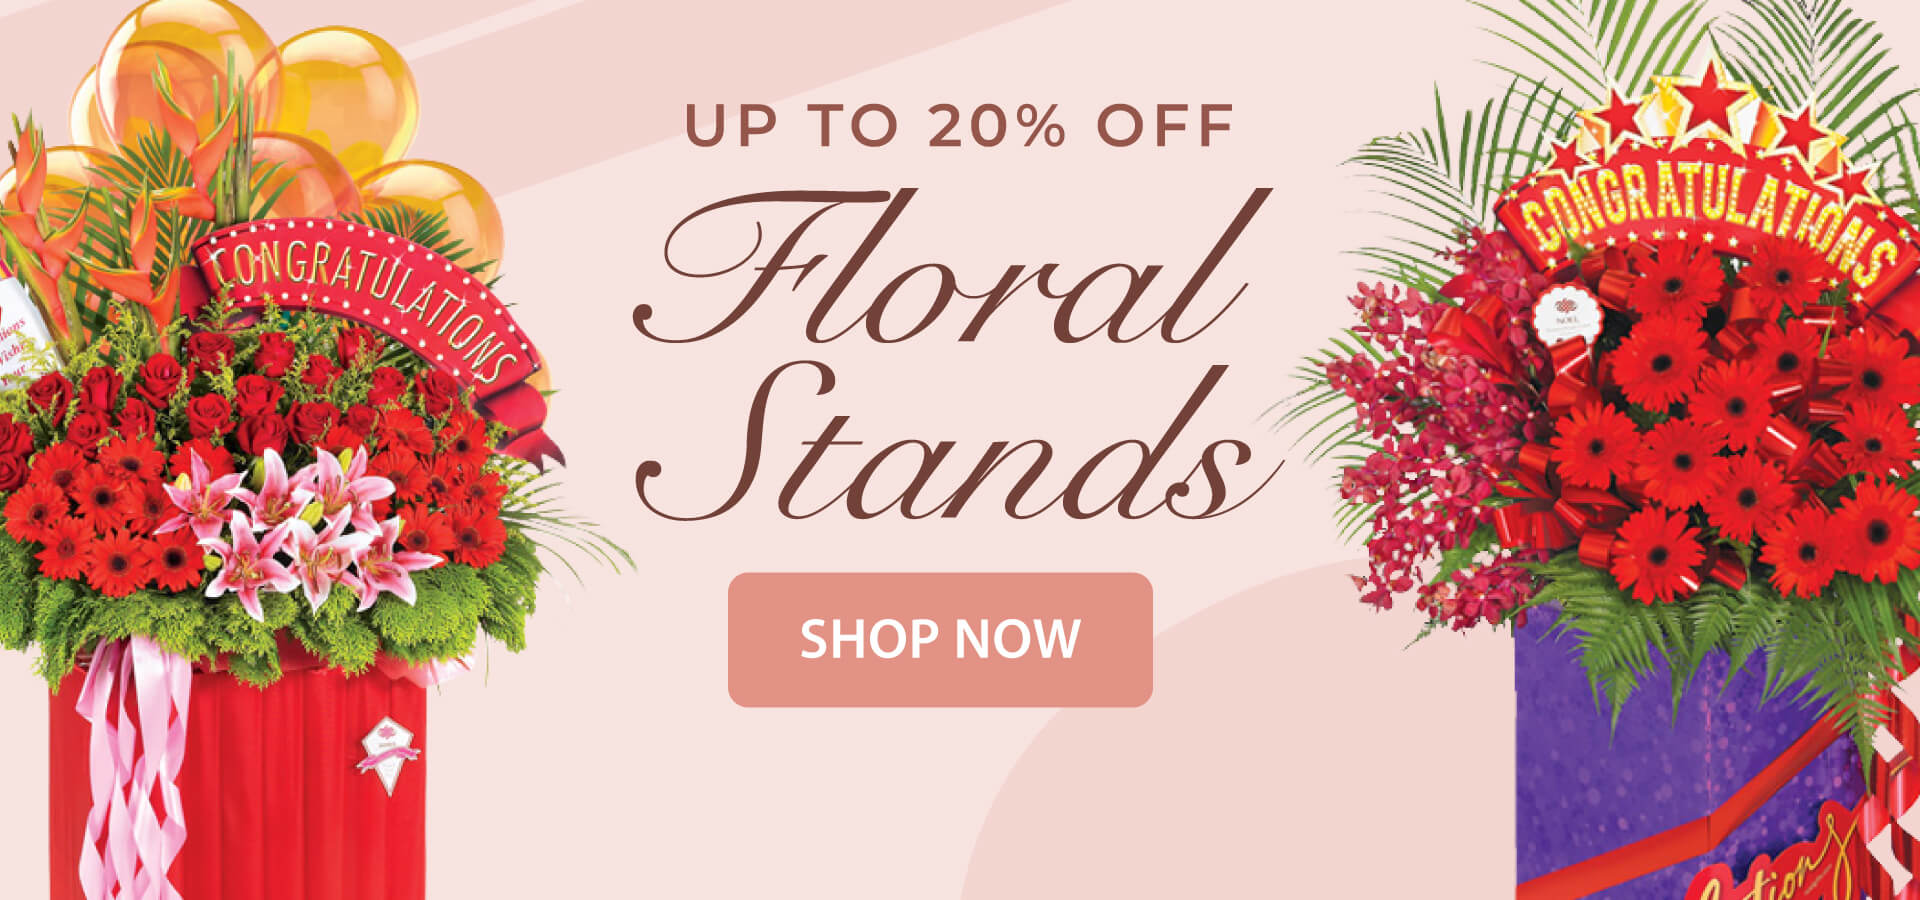 Congratulatory Flowers Stand Singapore